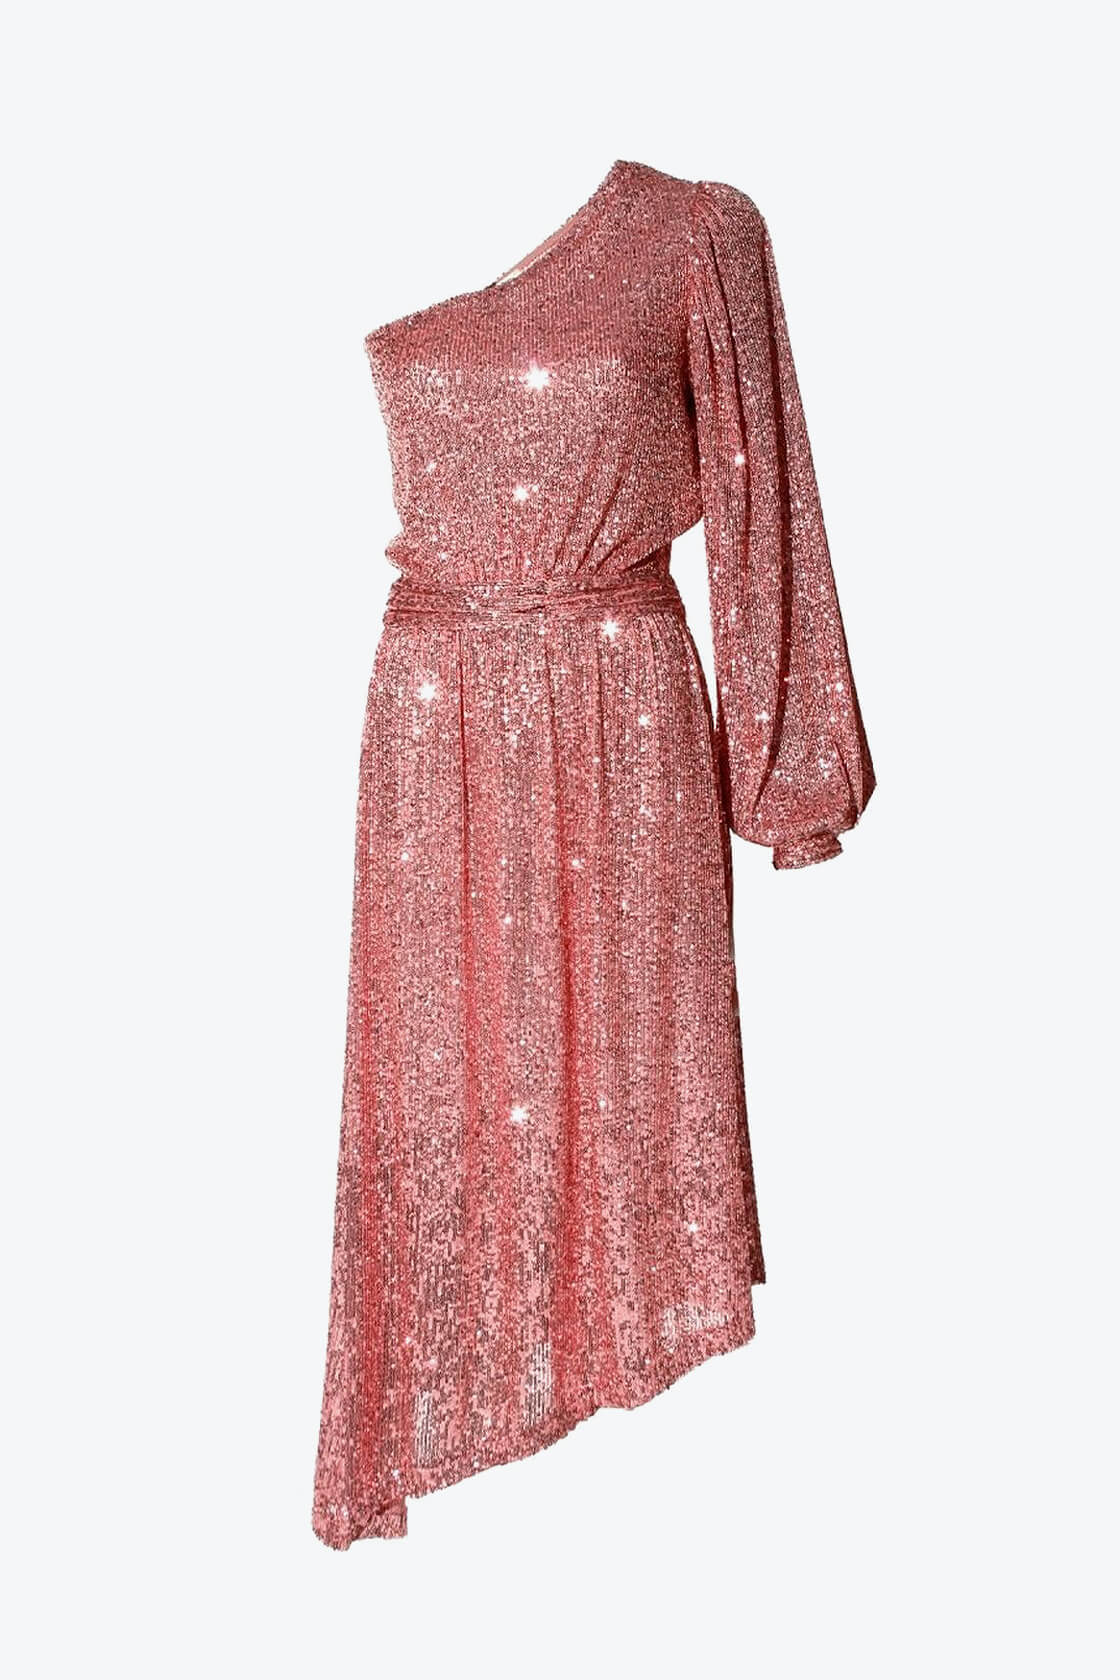 OL100002628 Dress Veronica Evening Sand1